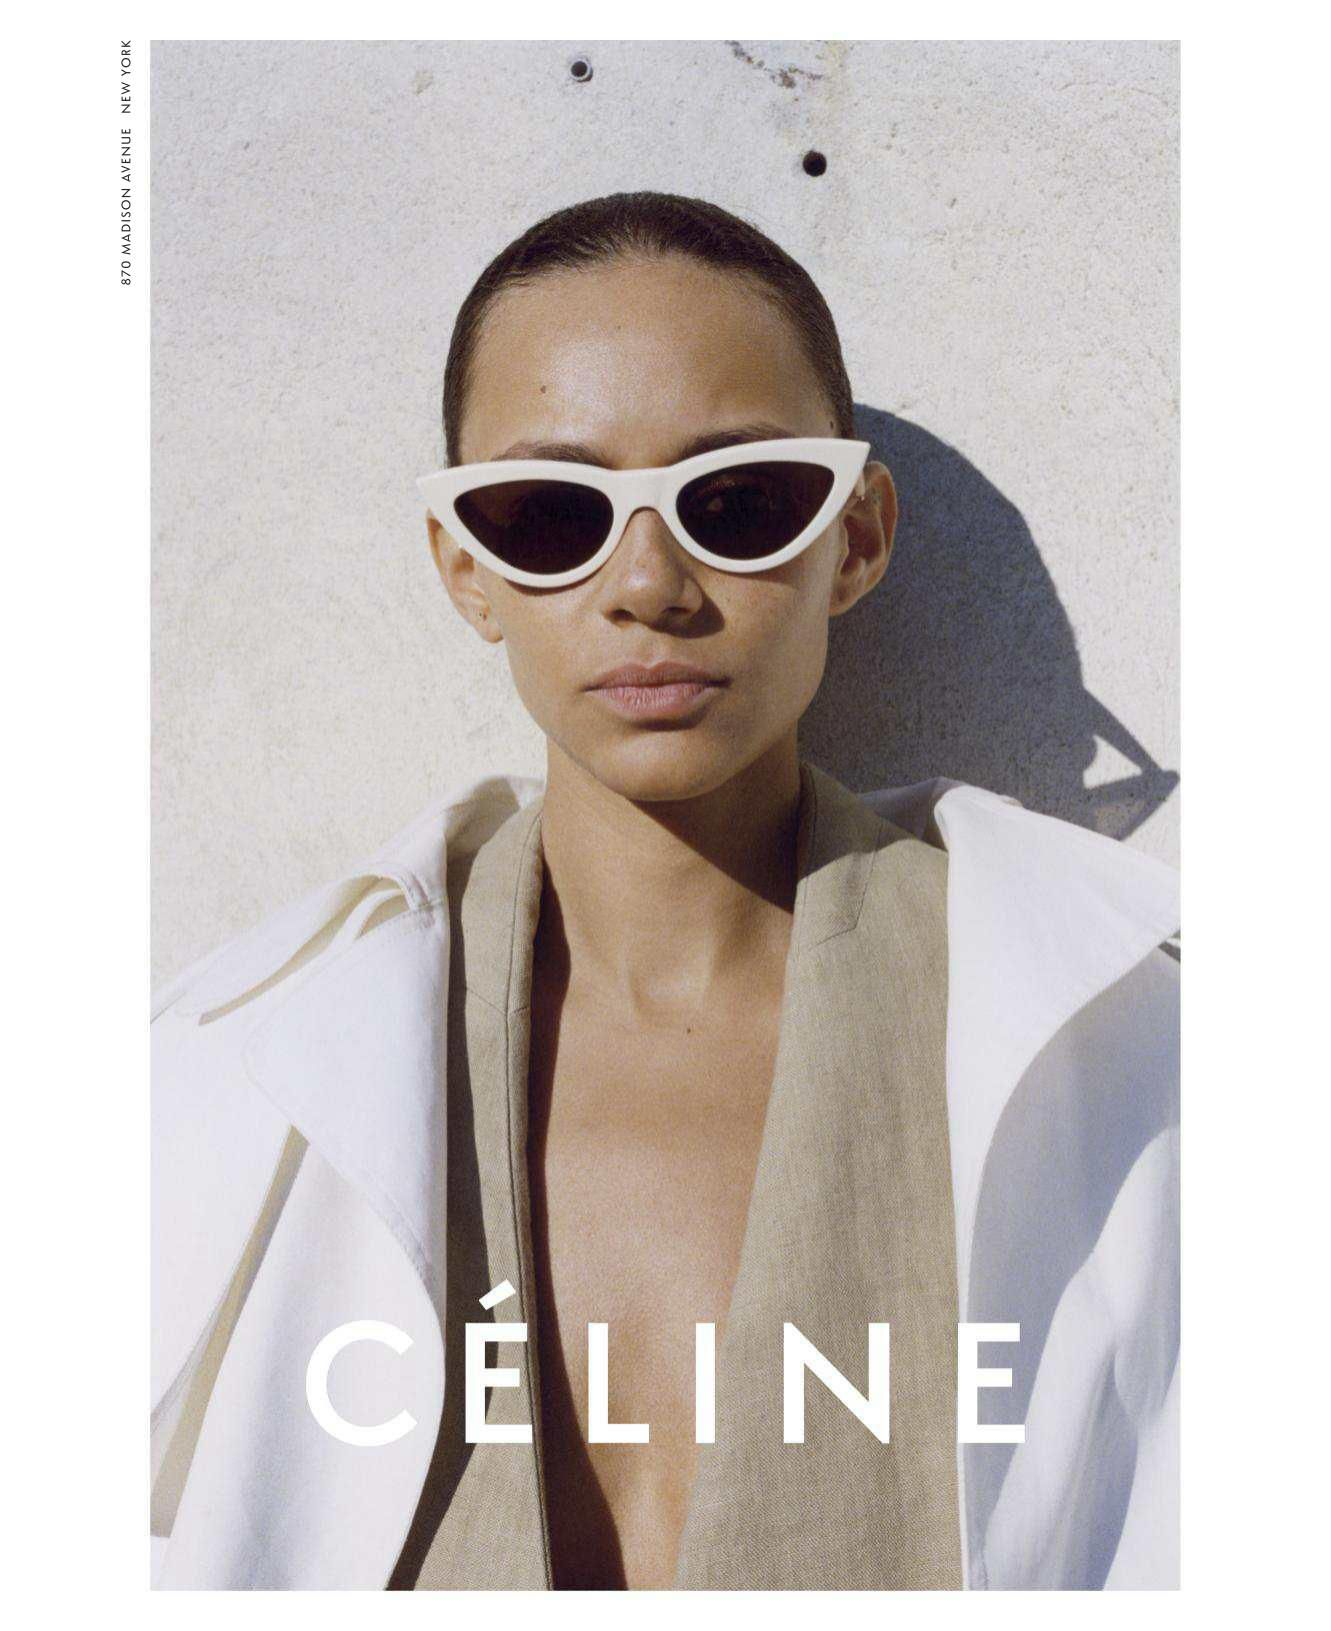 8d40a85404 Celine Spring Summer 2018 Binx Walton by Juergen Teller